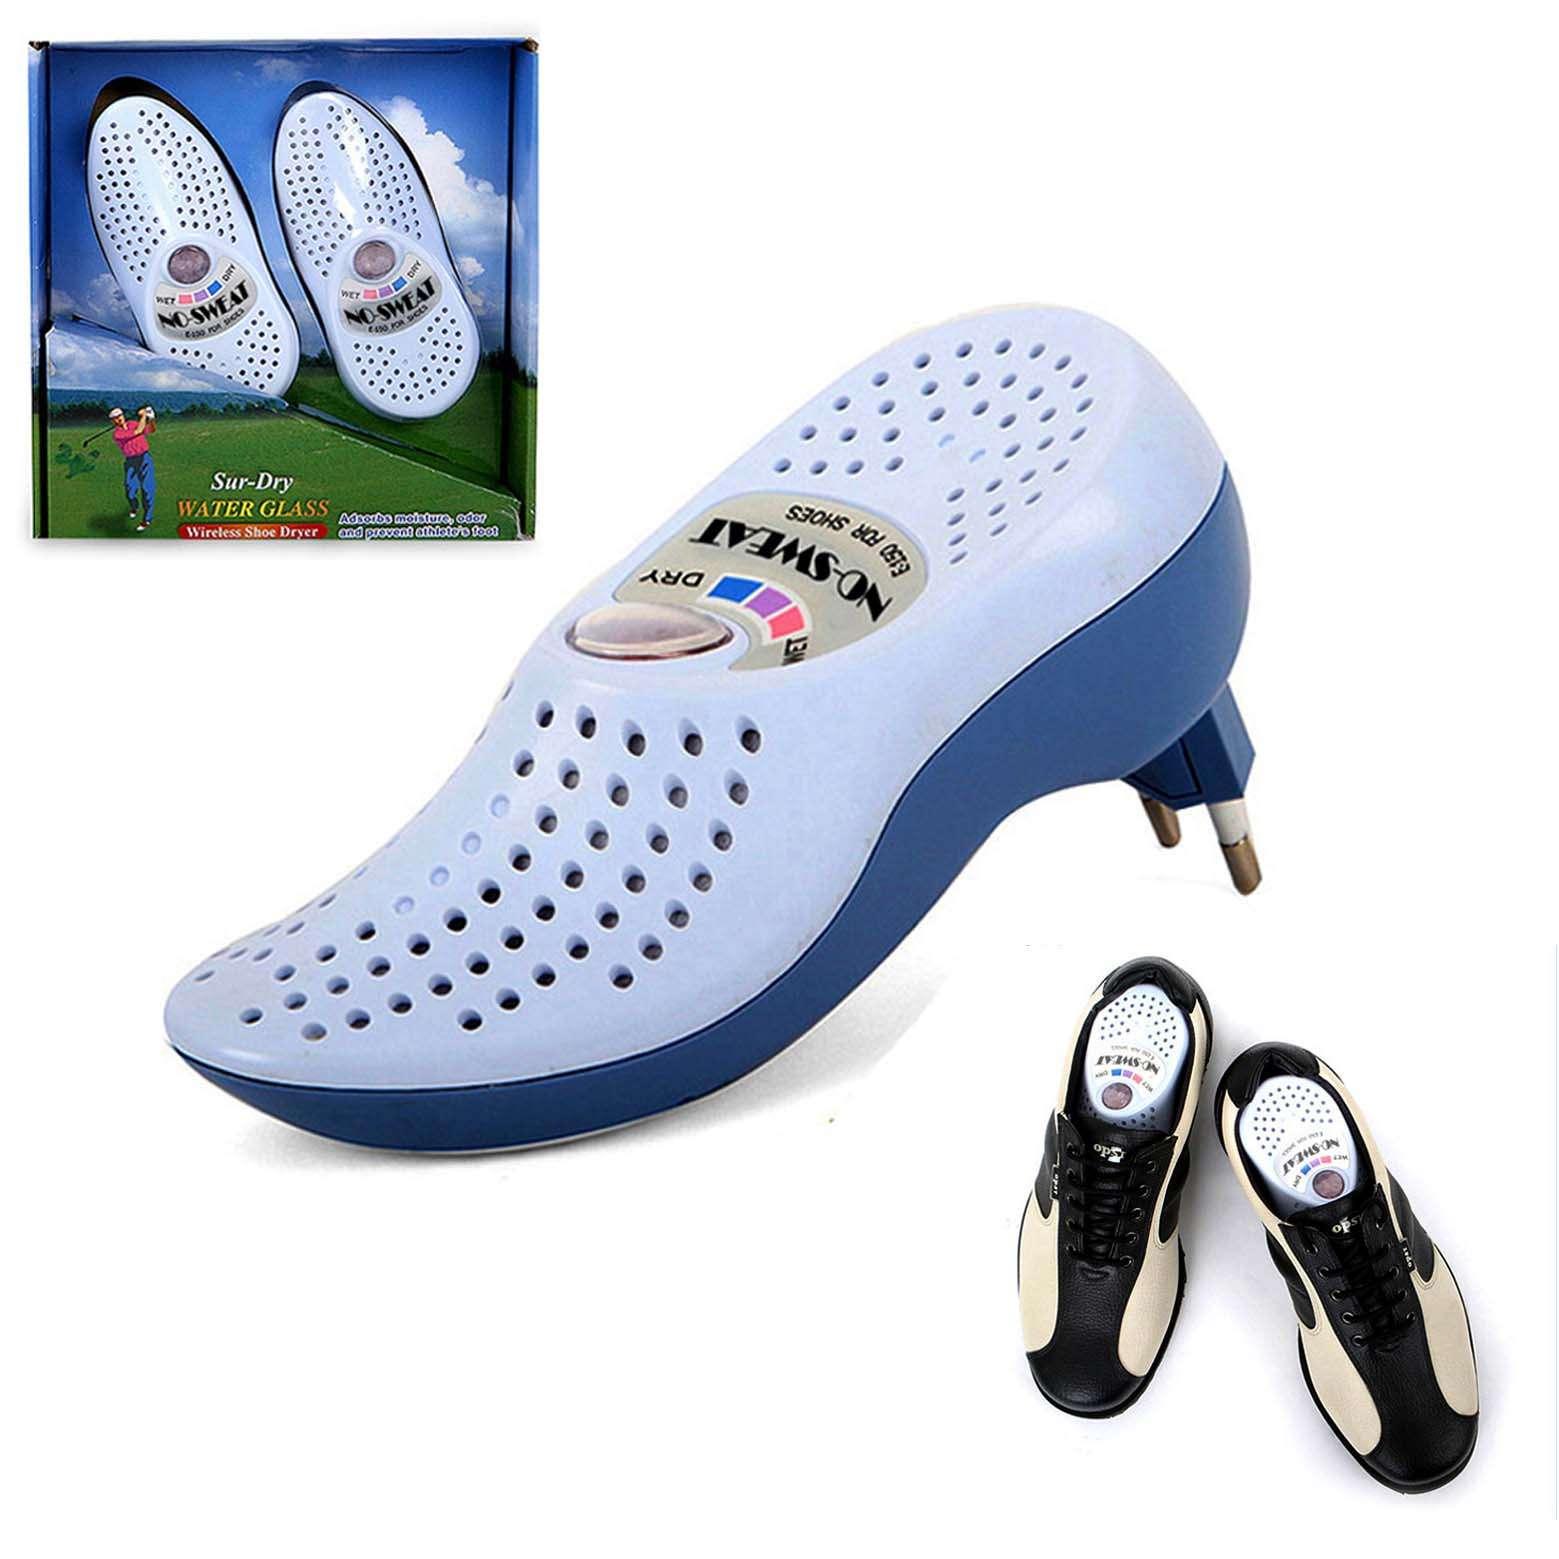 New Portable Silica Gel Absorbent Wet Shoe Dryer Shoe